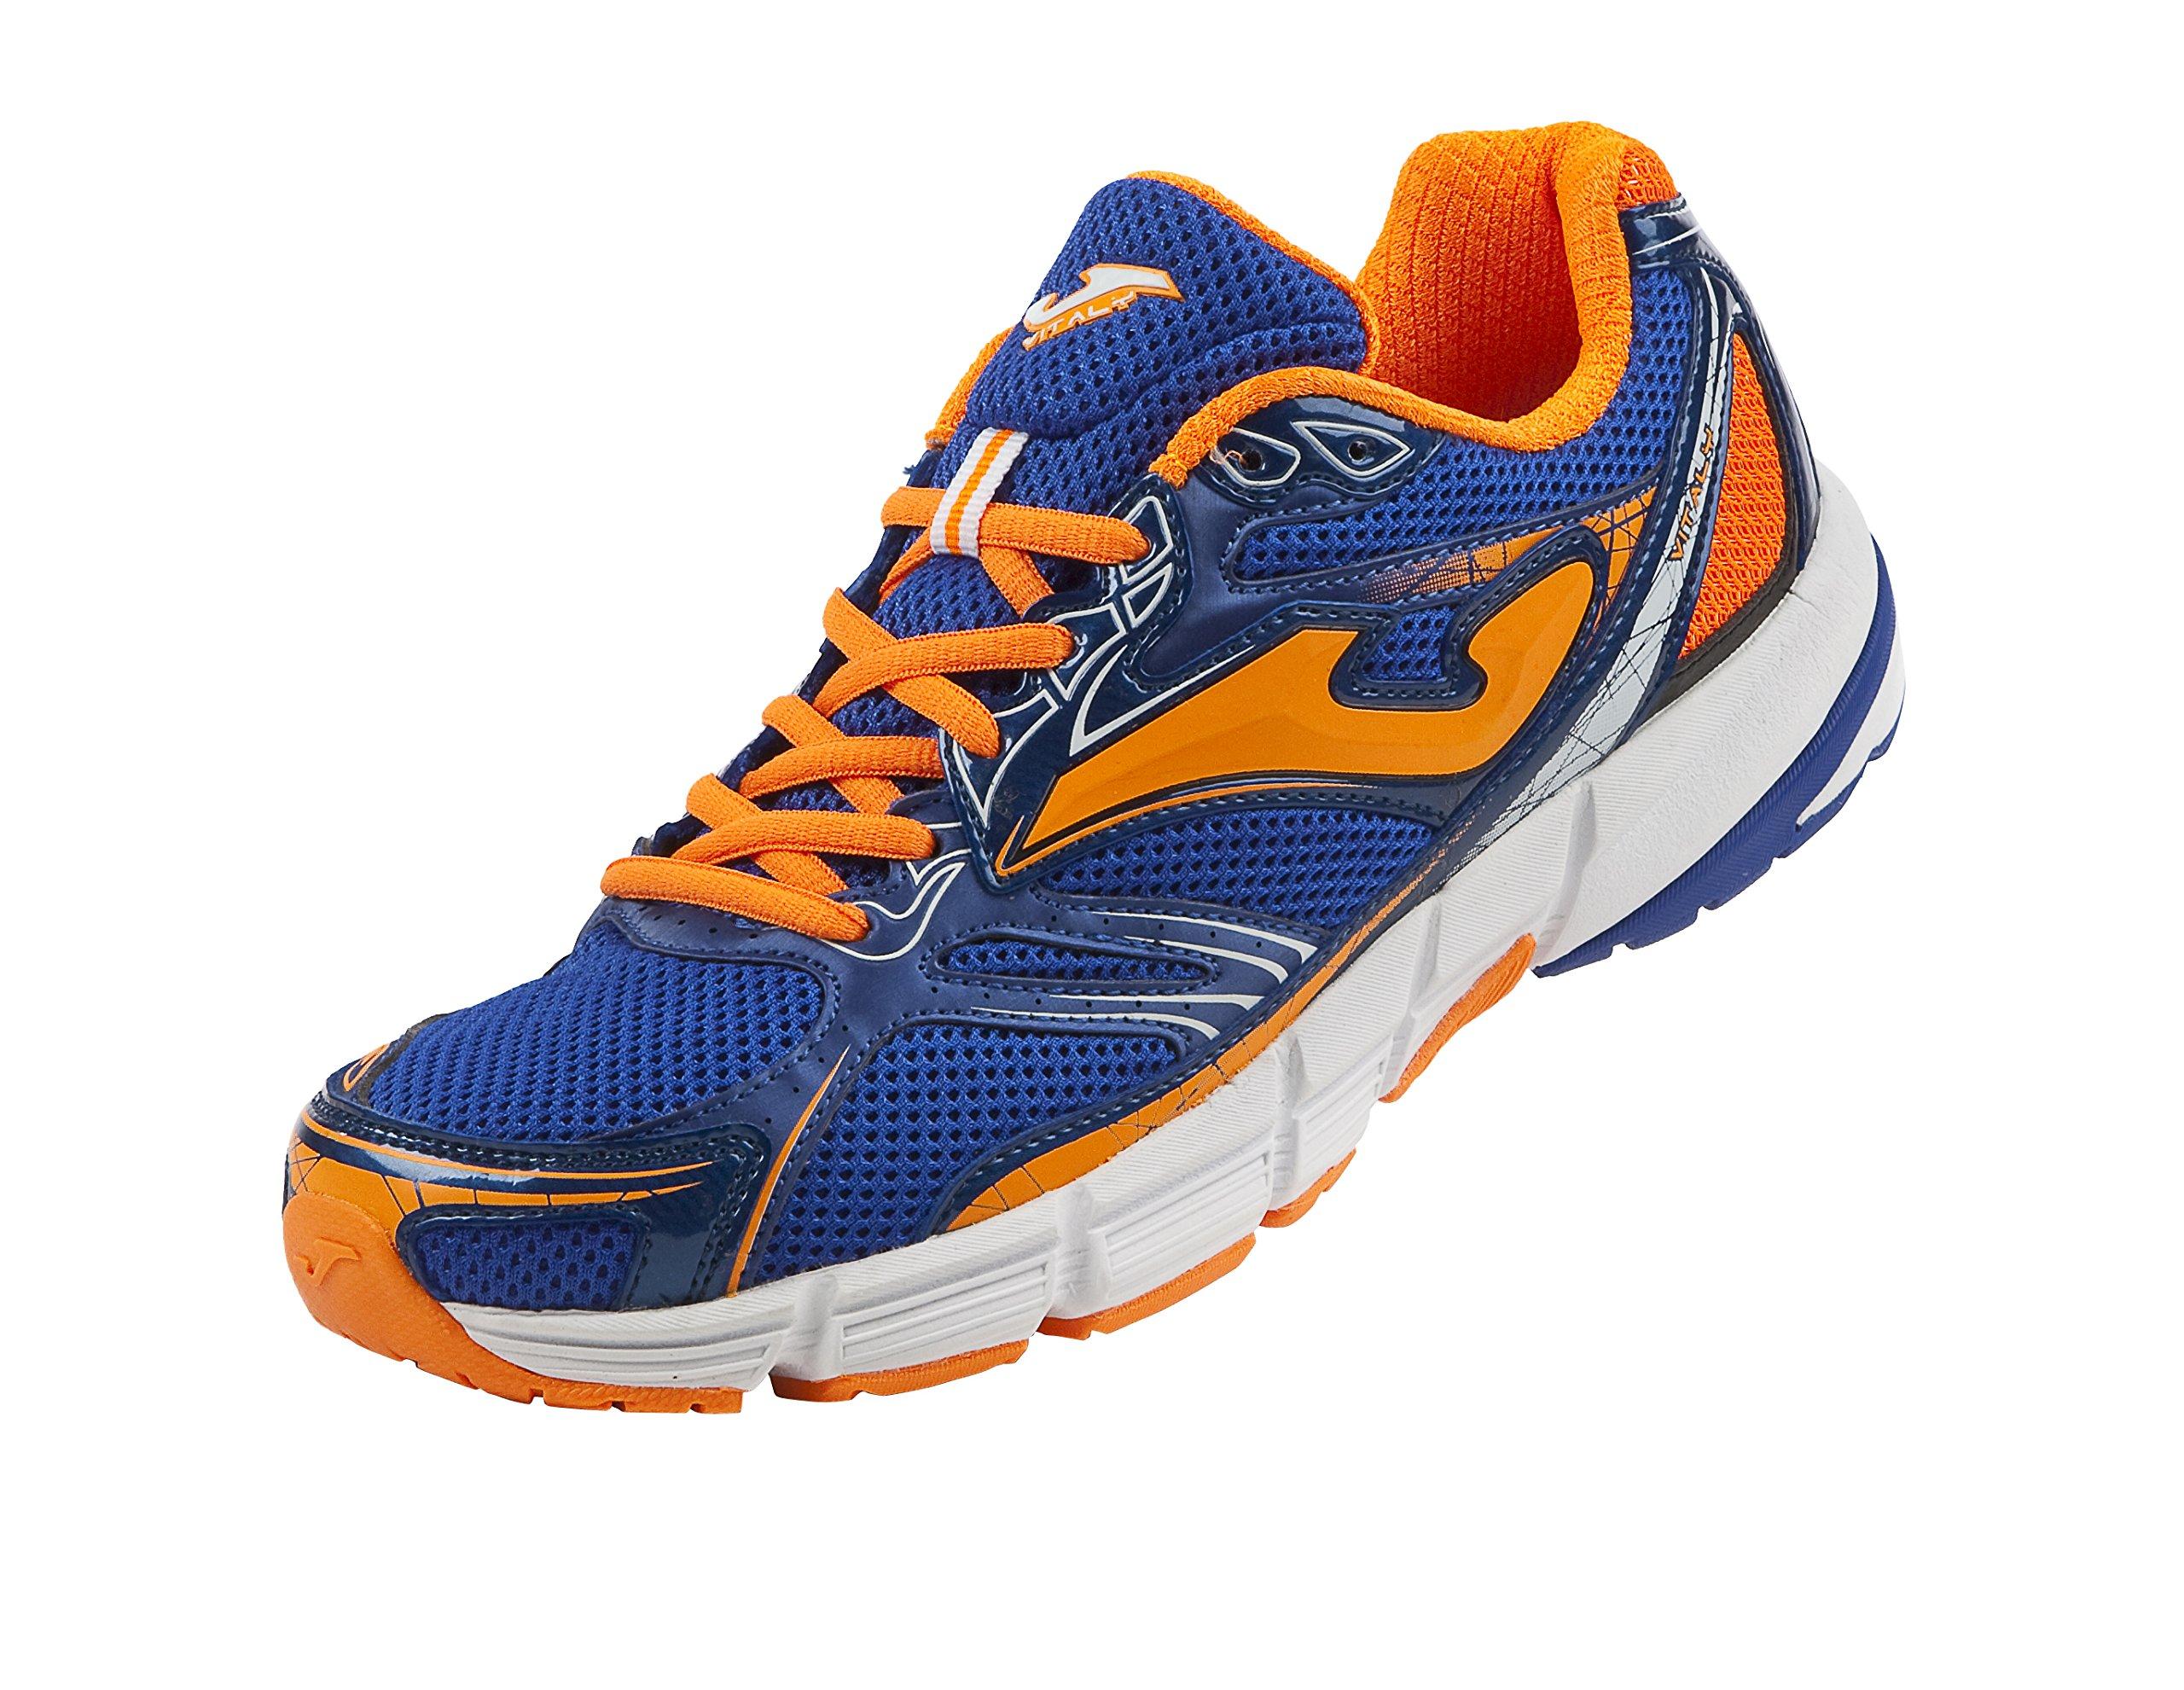 JOMA R.VITALY Shoe Spring Summer Zapatillas de Running Para Hombre ...